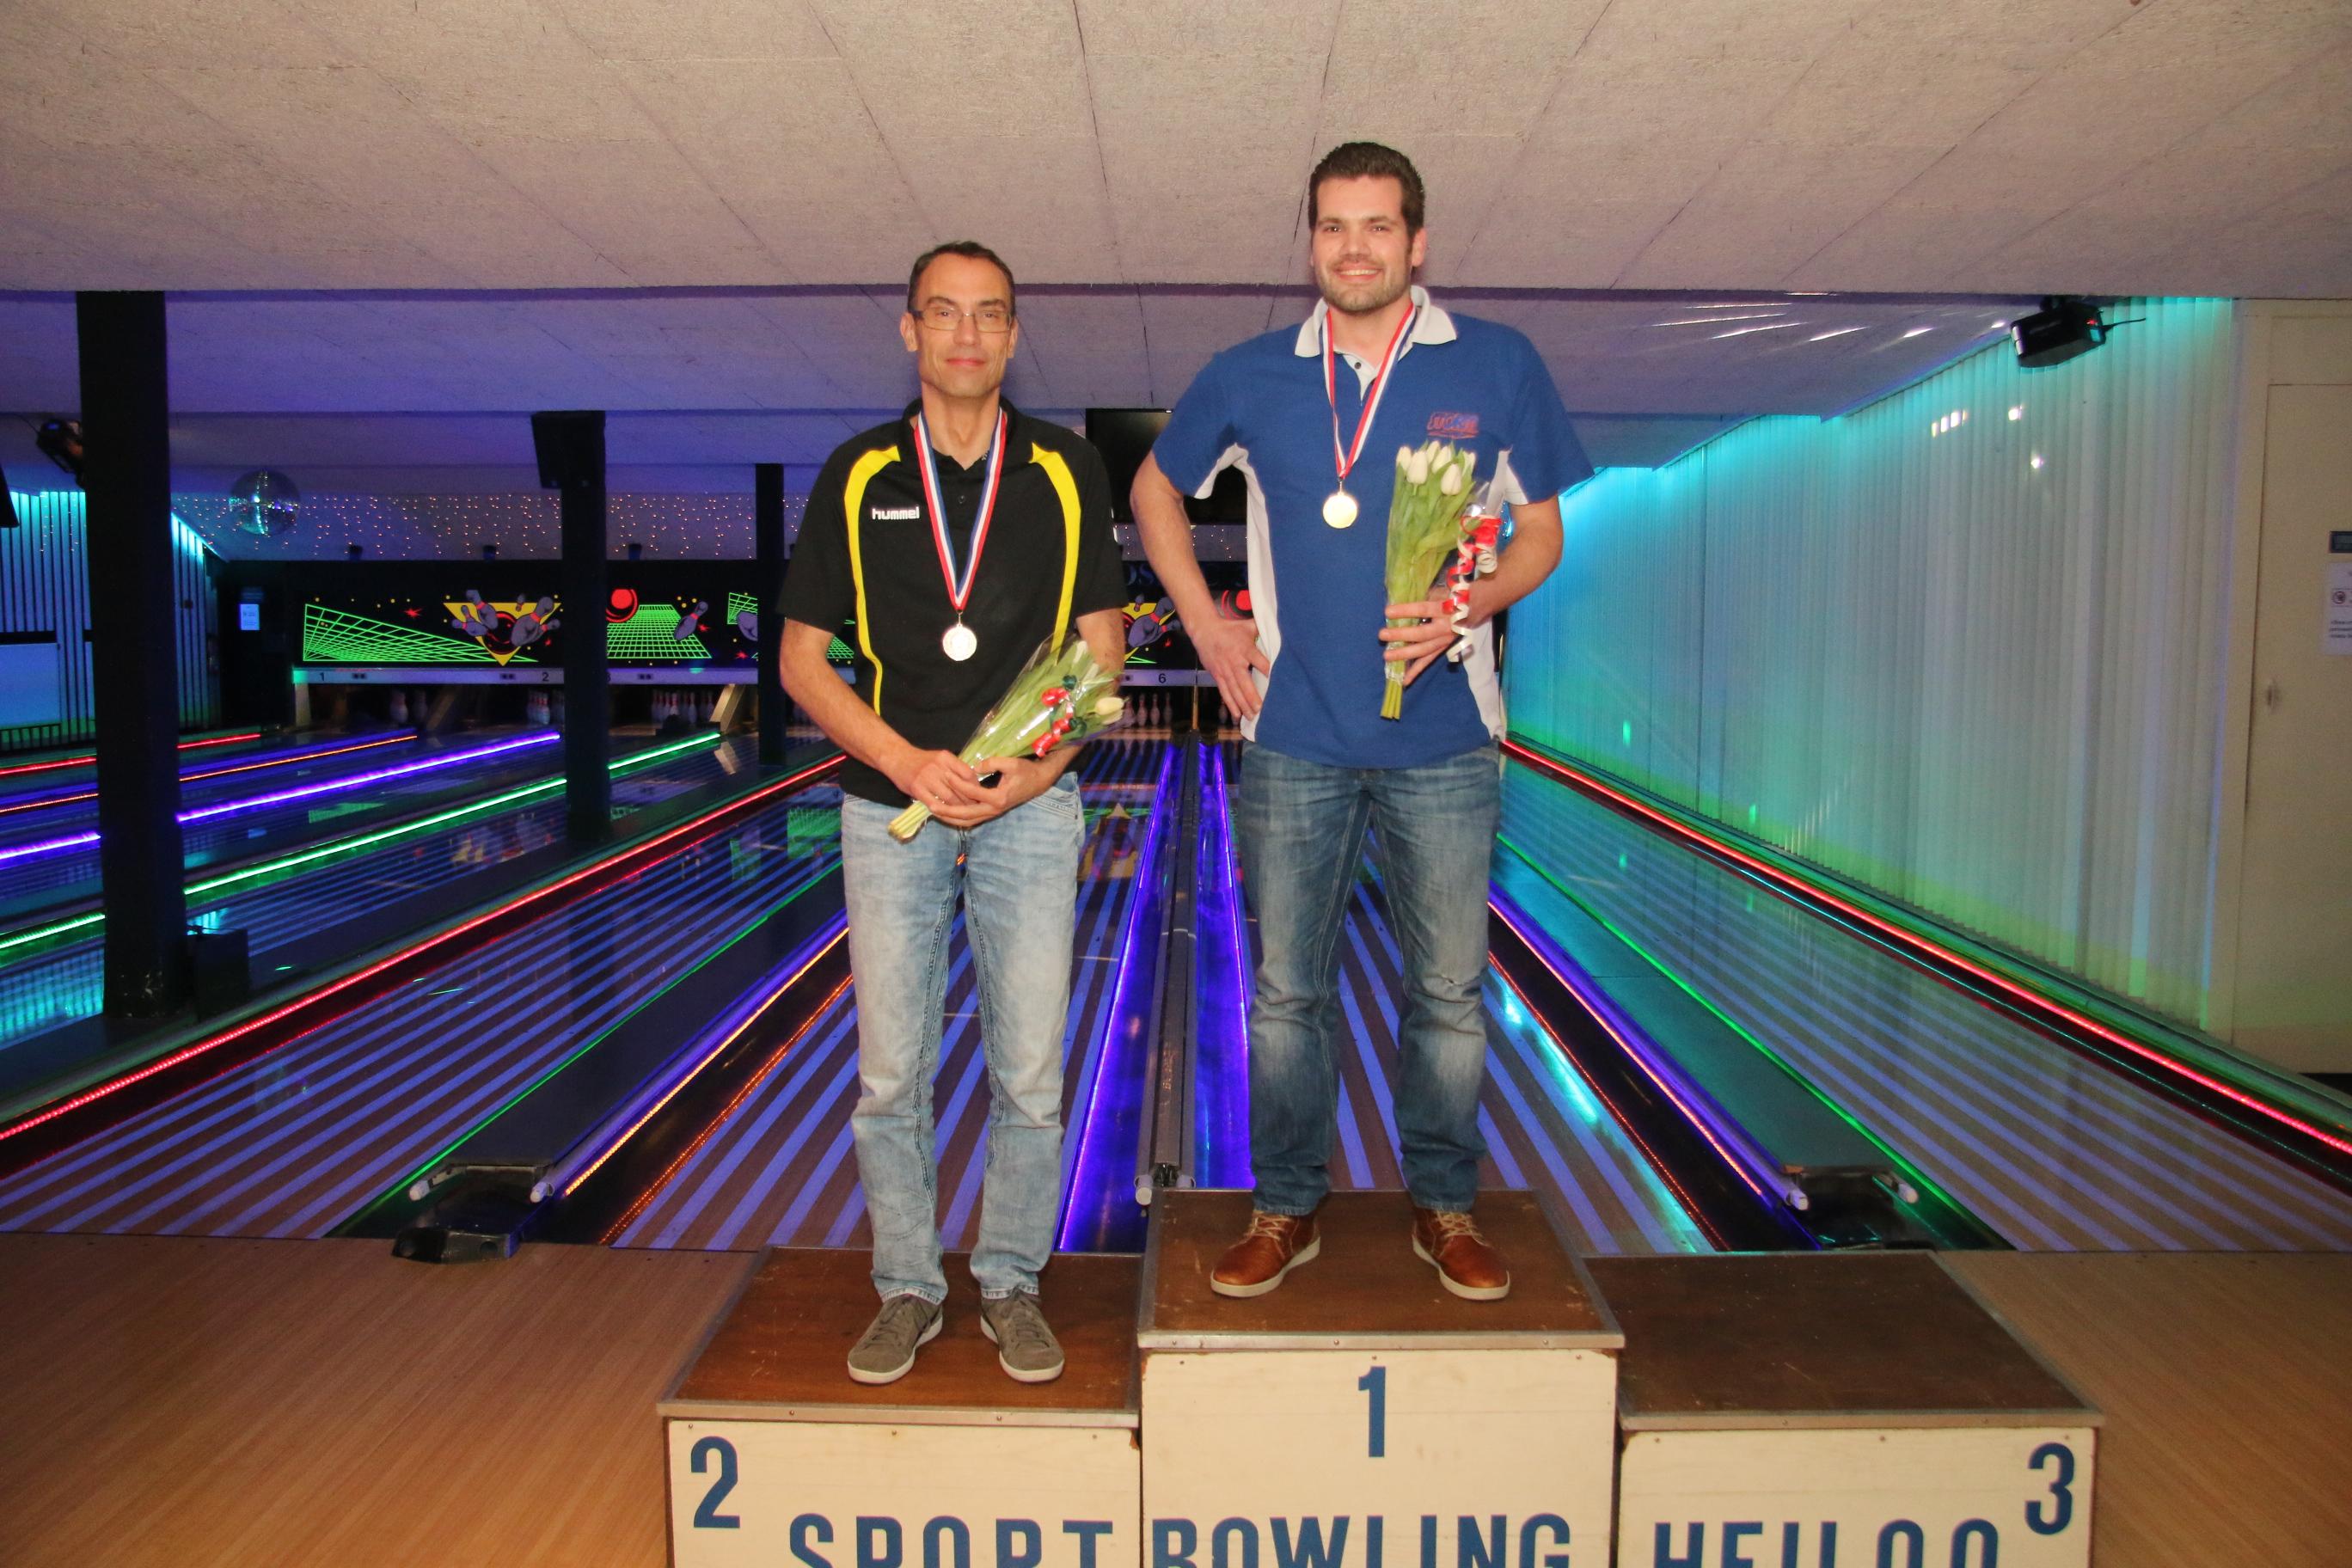 http://www.bowlingverenigingheiloo.nl/fotos_verhalen/foto's/2017_0210-Ver.kamp-Heren-B.jpg